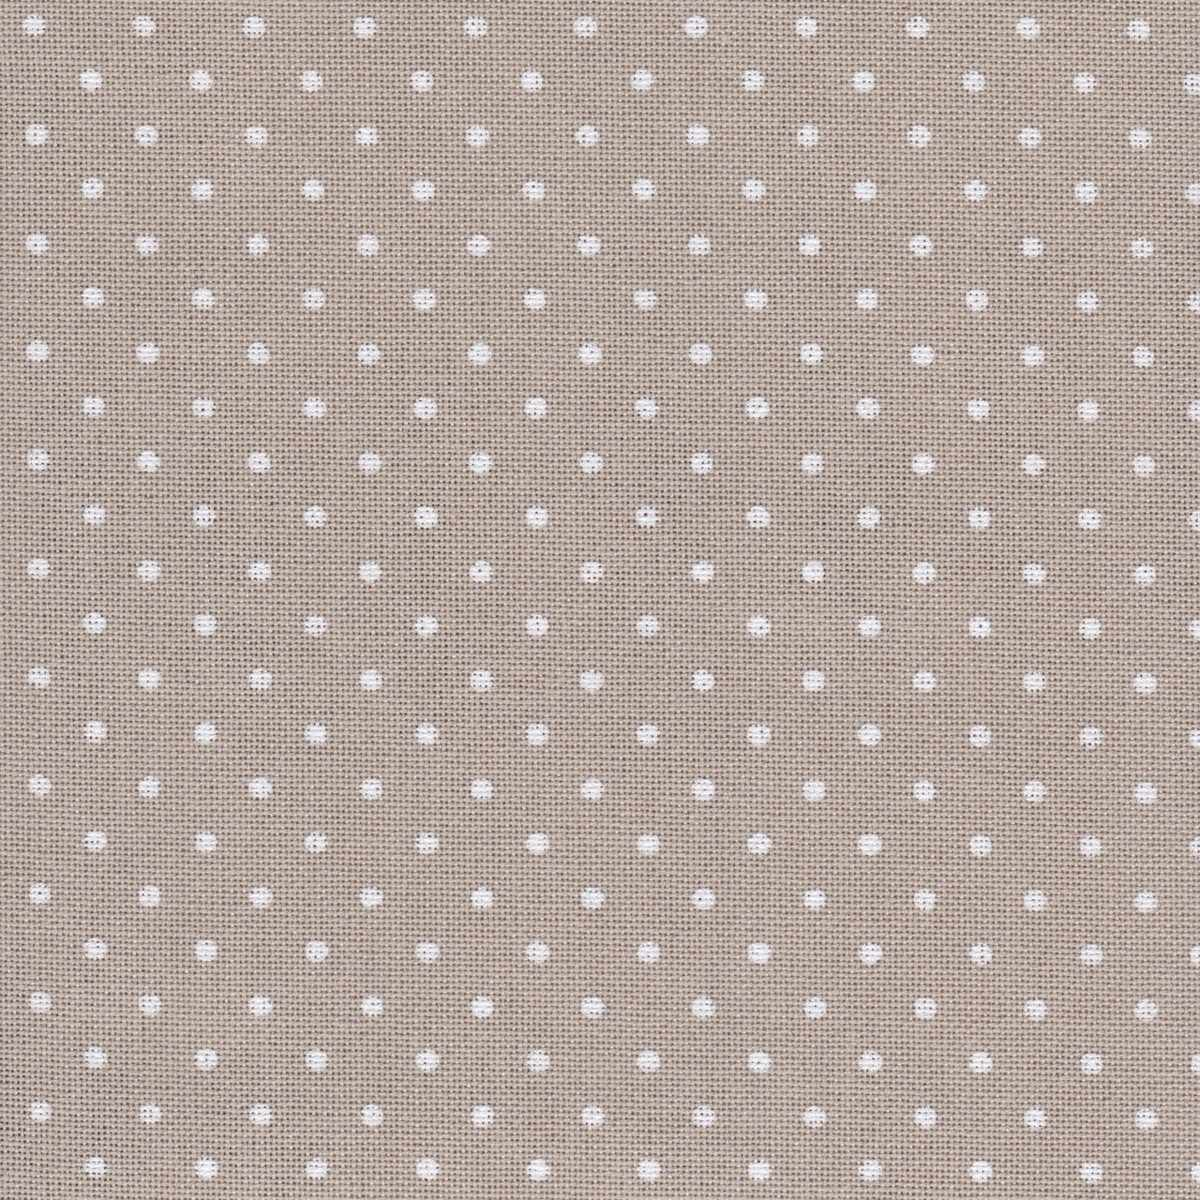 Канва Zweigart 3984 Murano(52% хл+48%вис) цвет 7309 шир 140 32ct